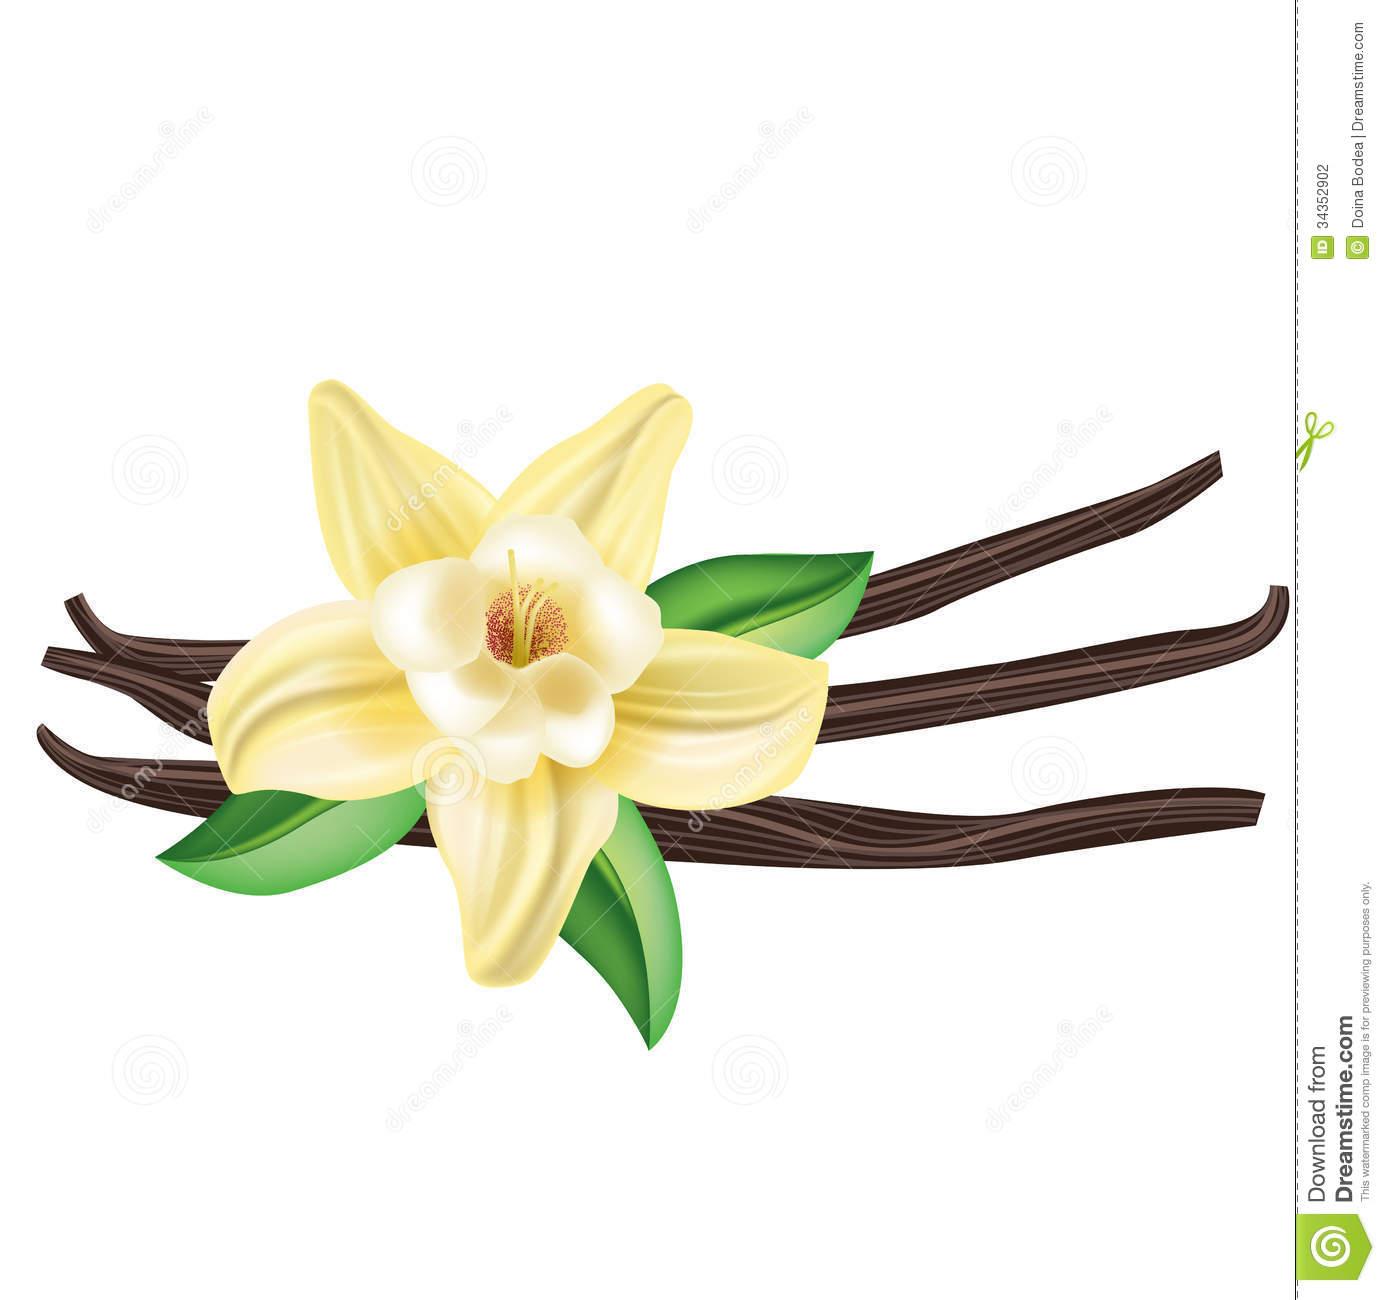 1385x1300 Vanilla Clipart Vanilla Flower Drawing Vanilla Bean Flower Odds